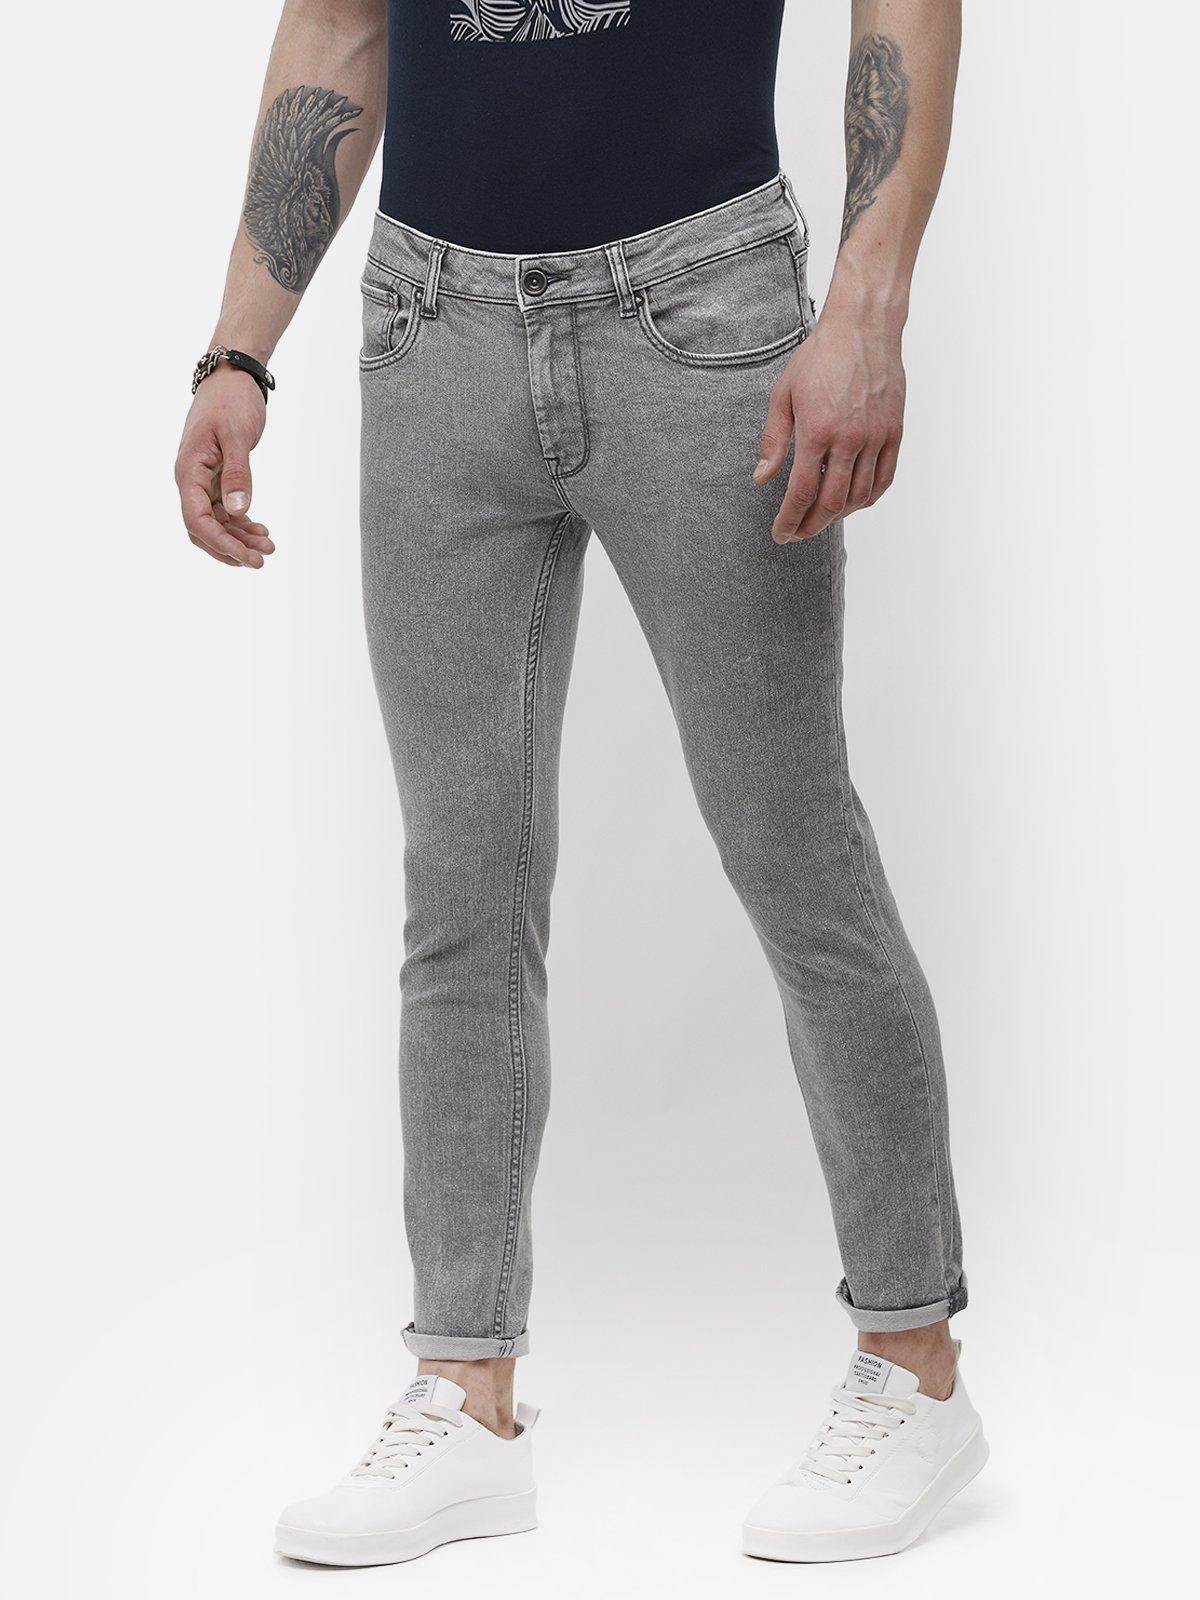 Voi Jeans | Gray Jeans (VOJN1511)